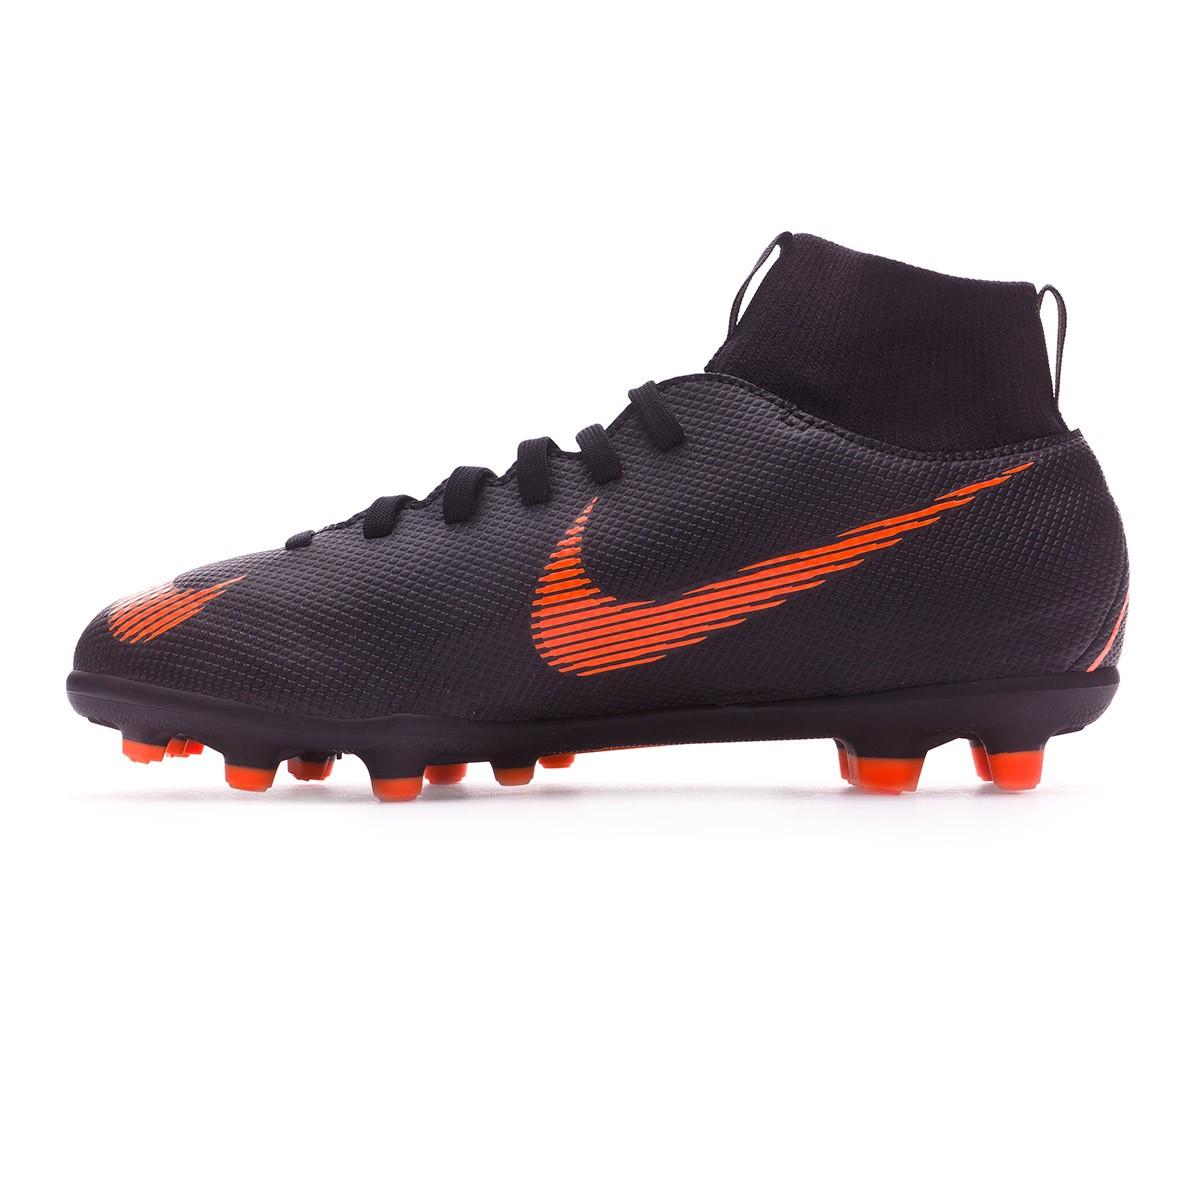 b37c91b7acd29 Scarpe Nike Mercurial Superfly VI Club MG Junior Black-Total orange-White -  Negozio di calcio Fútbol Emotion